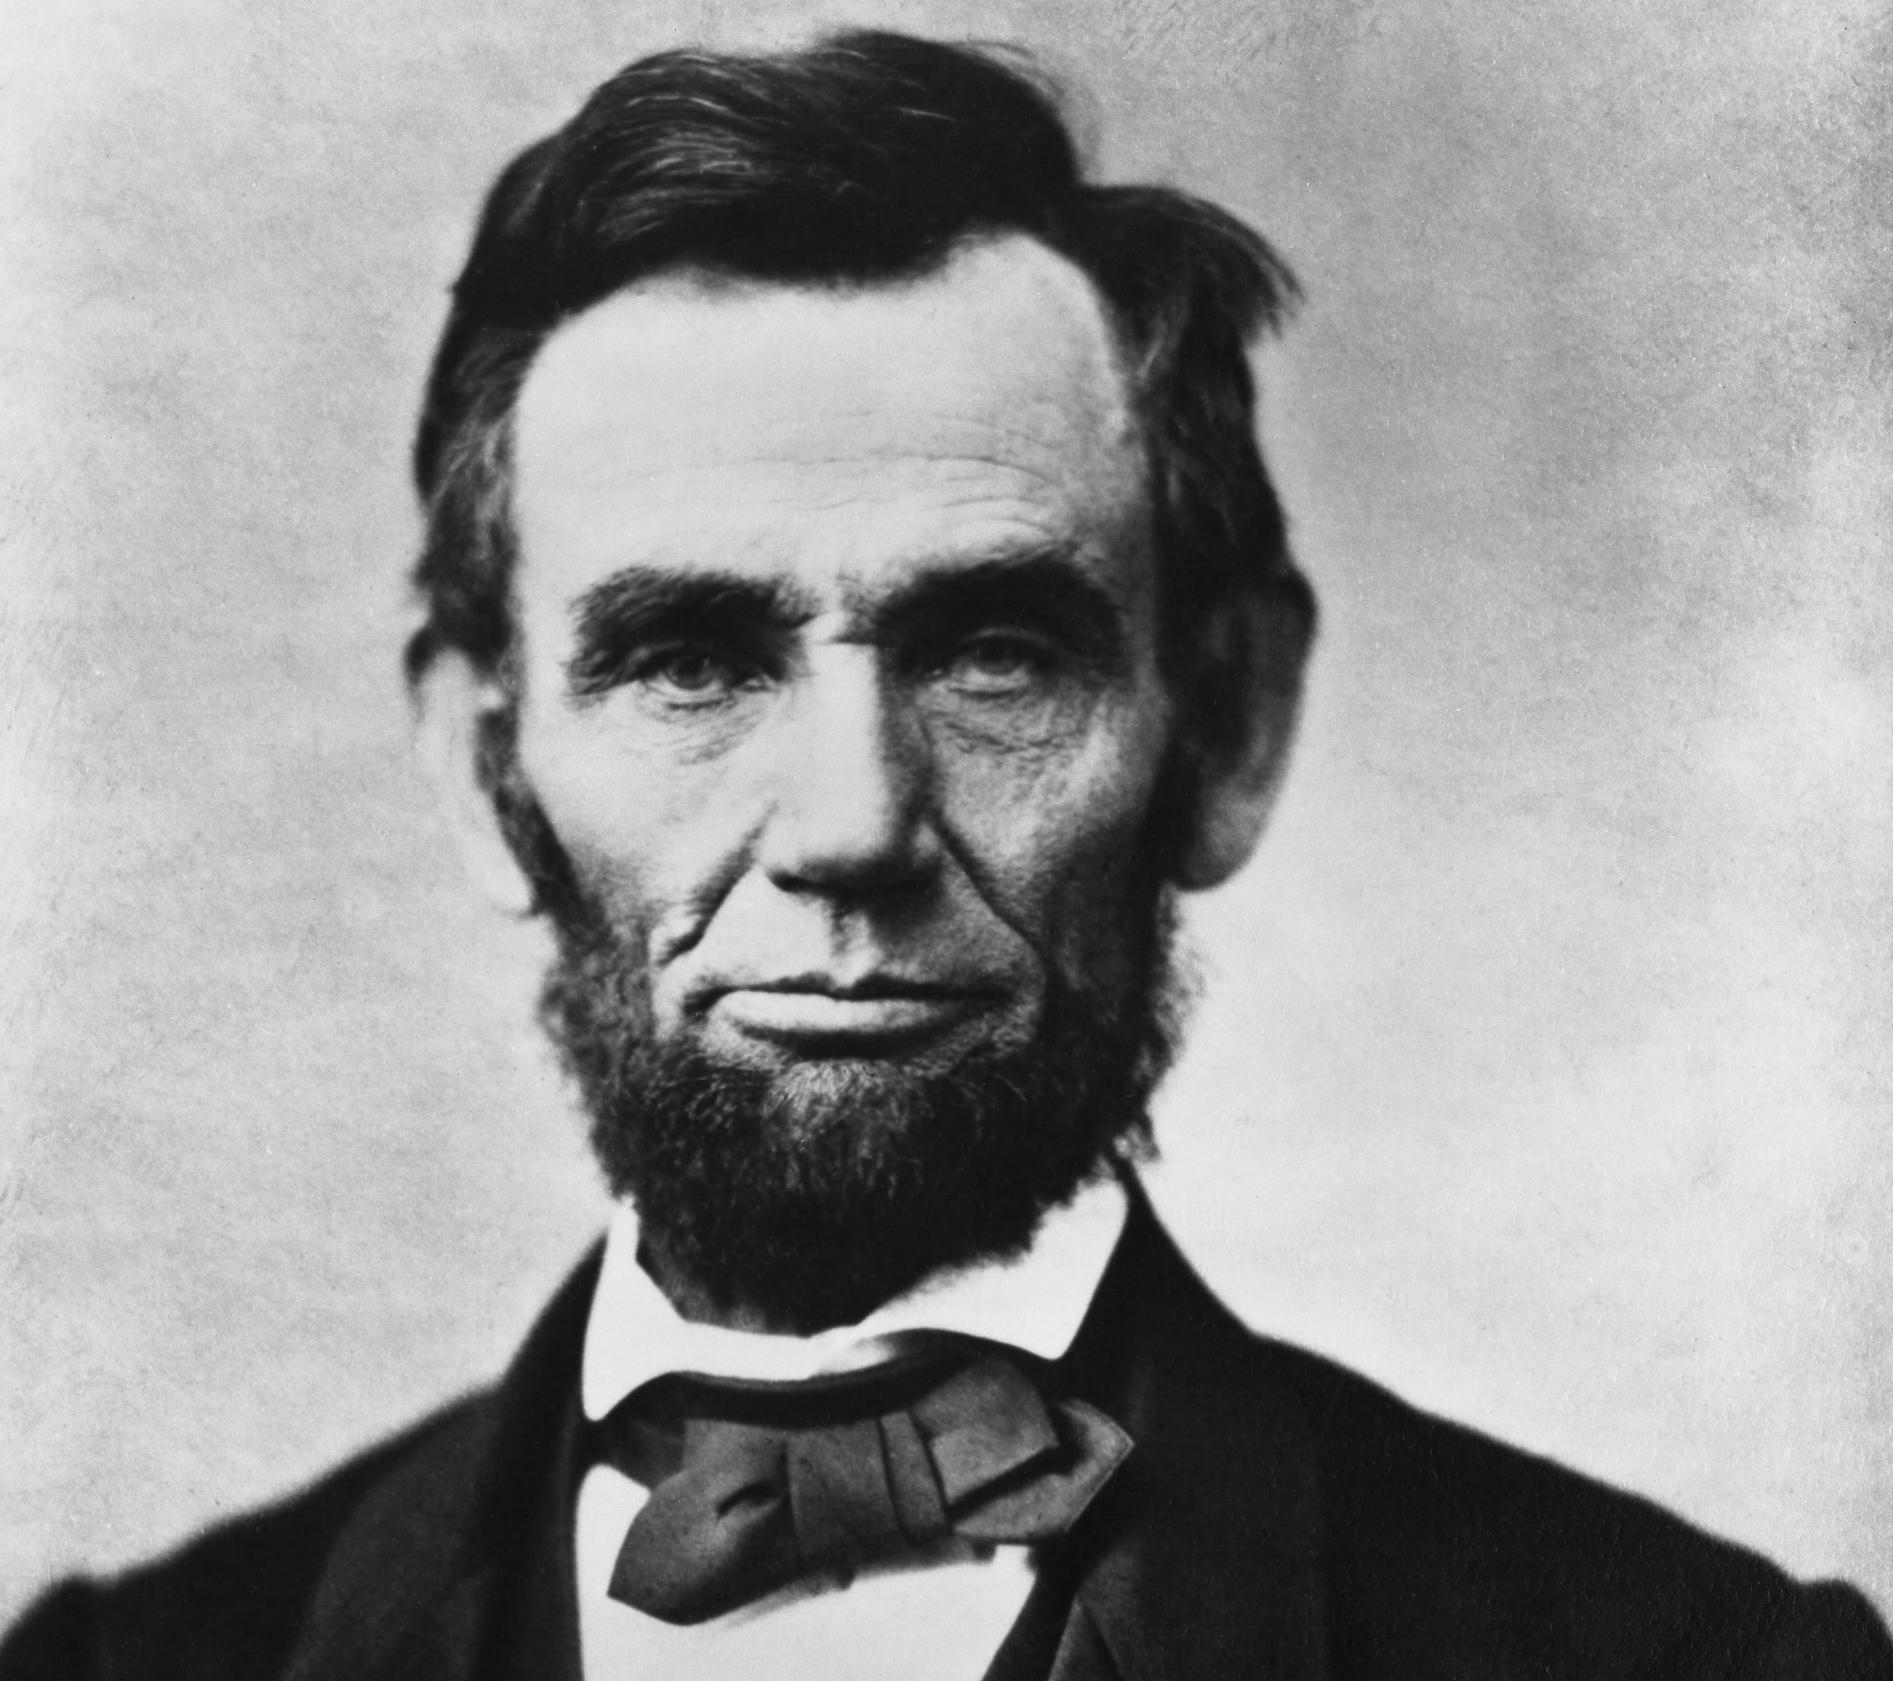 Abraham_Lincoln_head_on_shoulders_photo_portrait.jpg